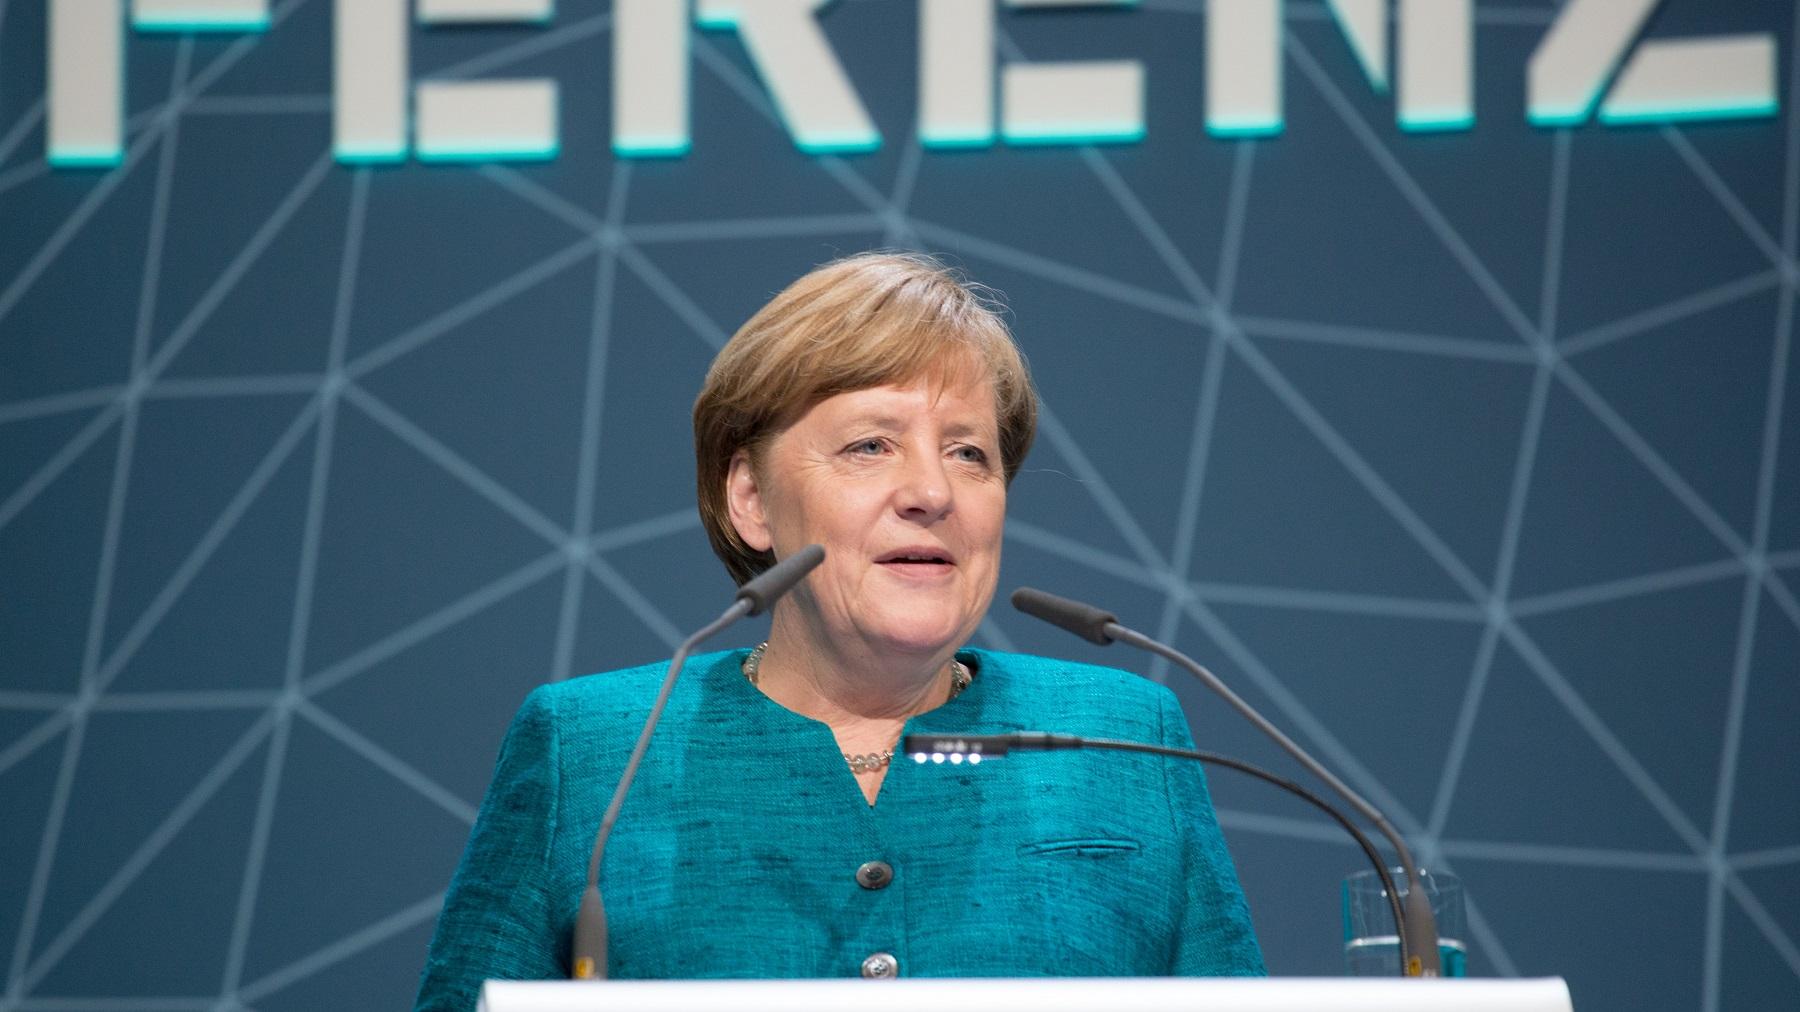 Angela Merkel 2017 - International Maritime Organization - IMO at German National Maritime Conference - CC BY 2.0